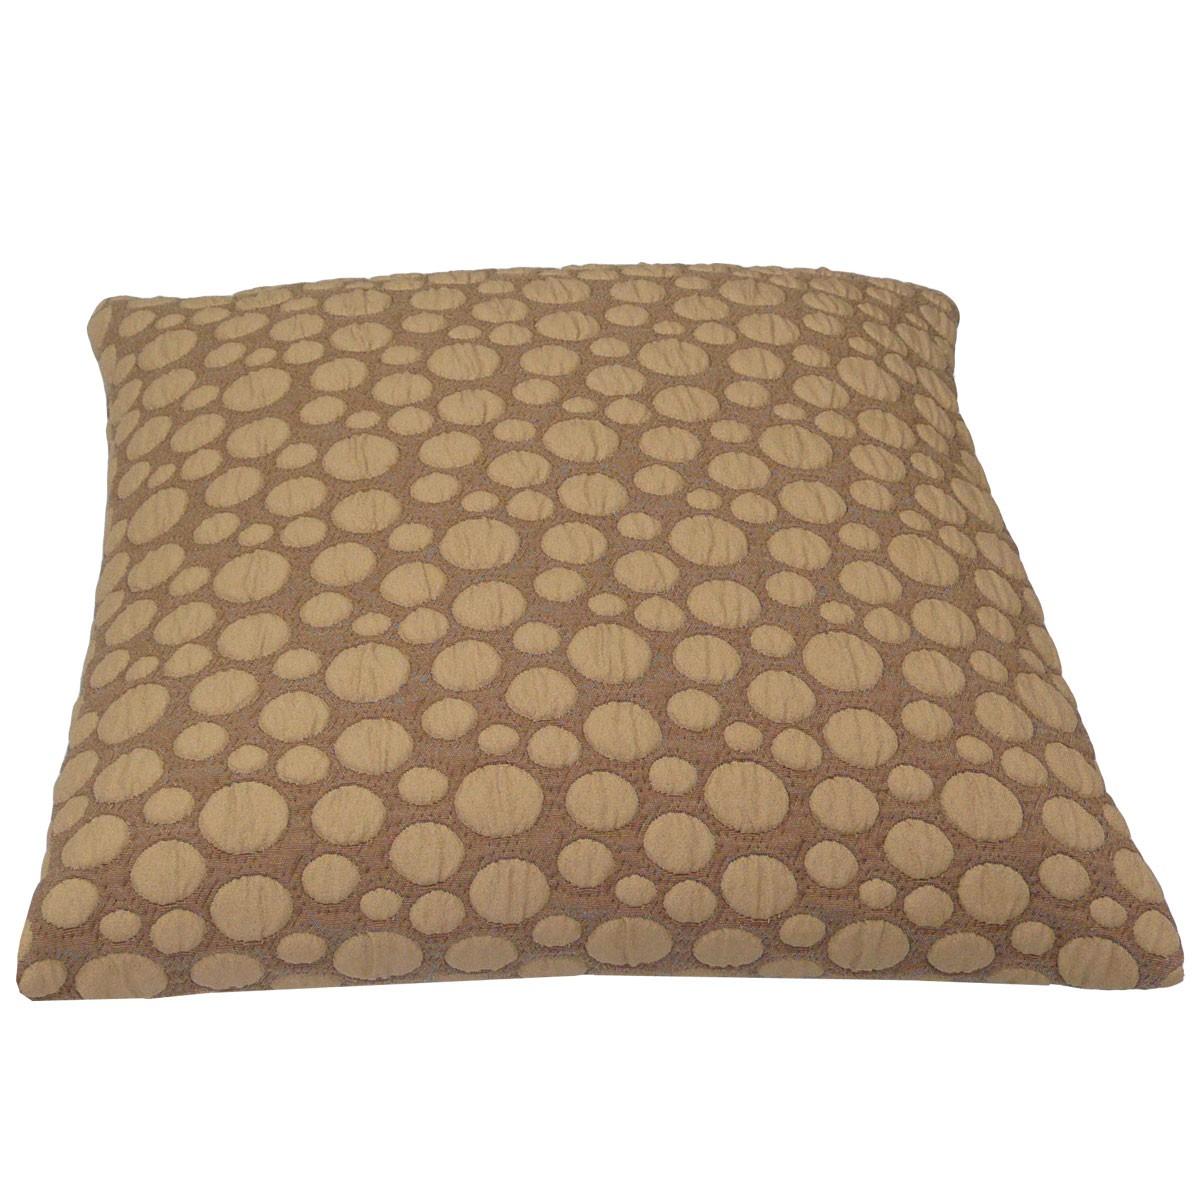 kissen kissenh lle beige mit punkten 50x50cm wohntextilien kissen young trendy. Black Bedroom Furniture Sets. Home Design Ideas